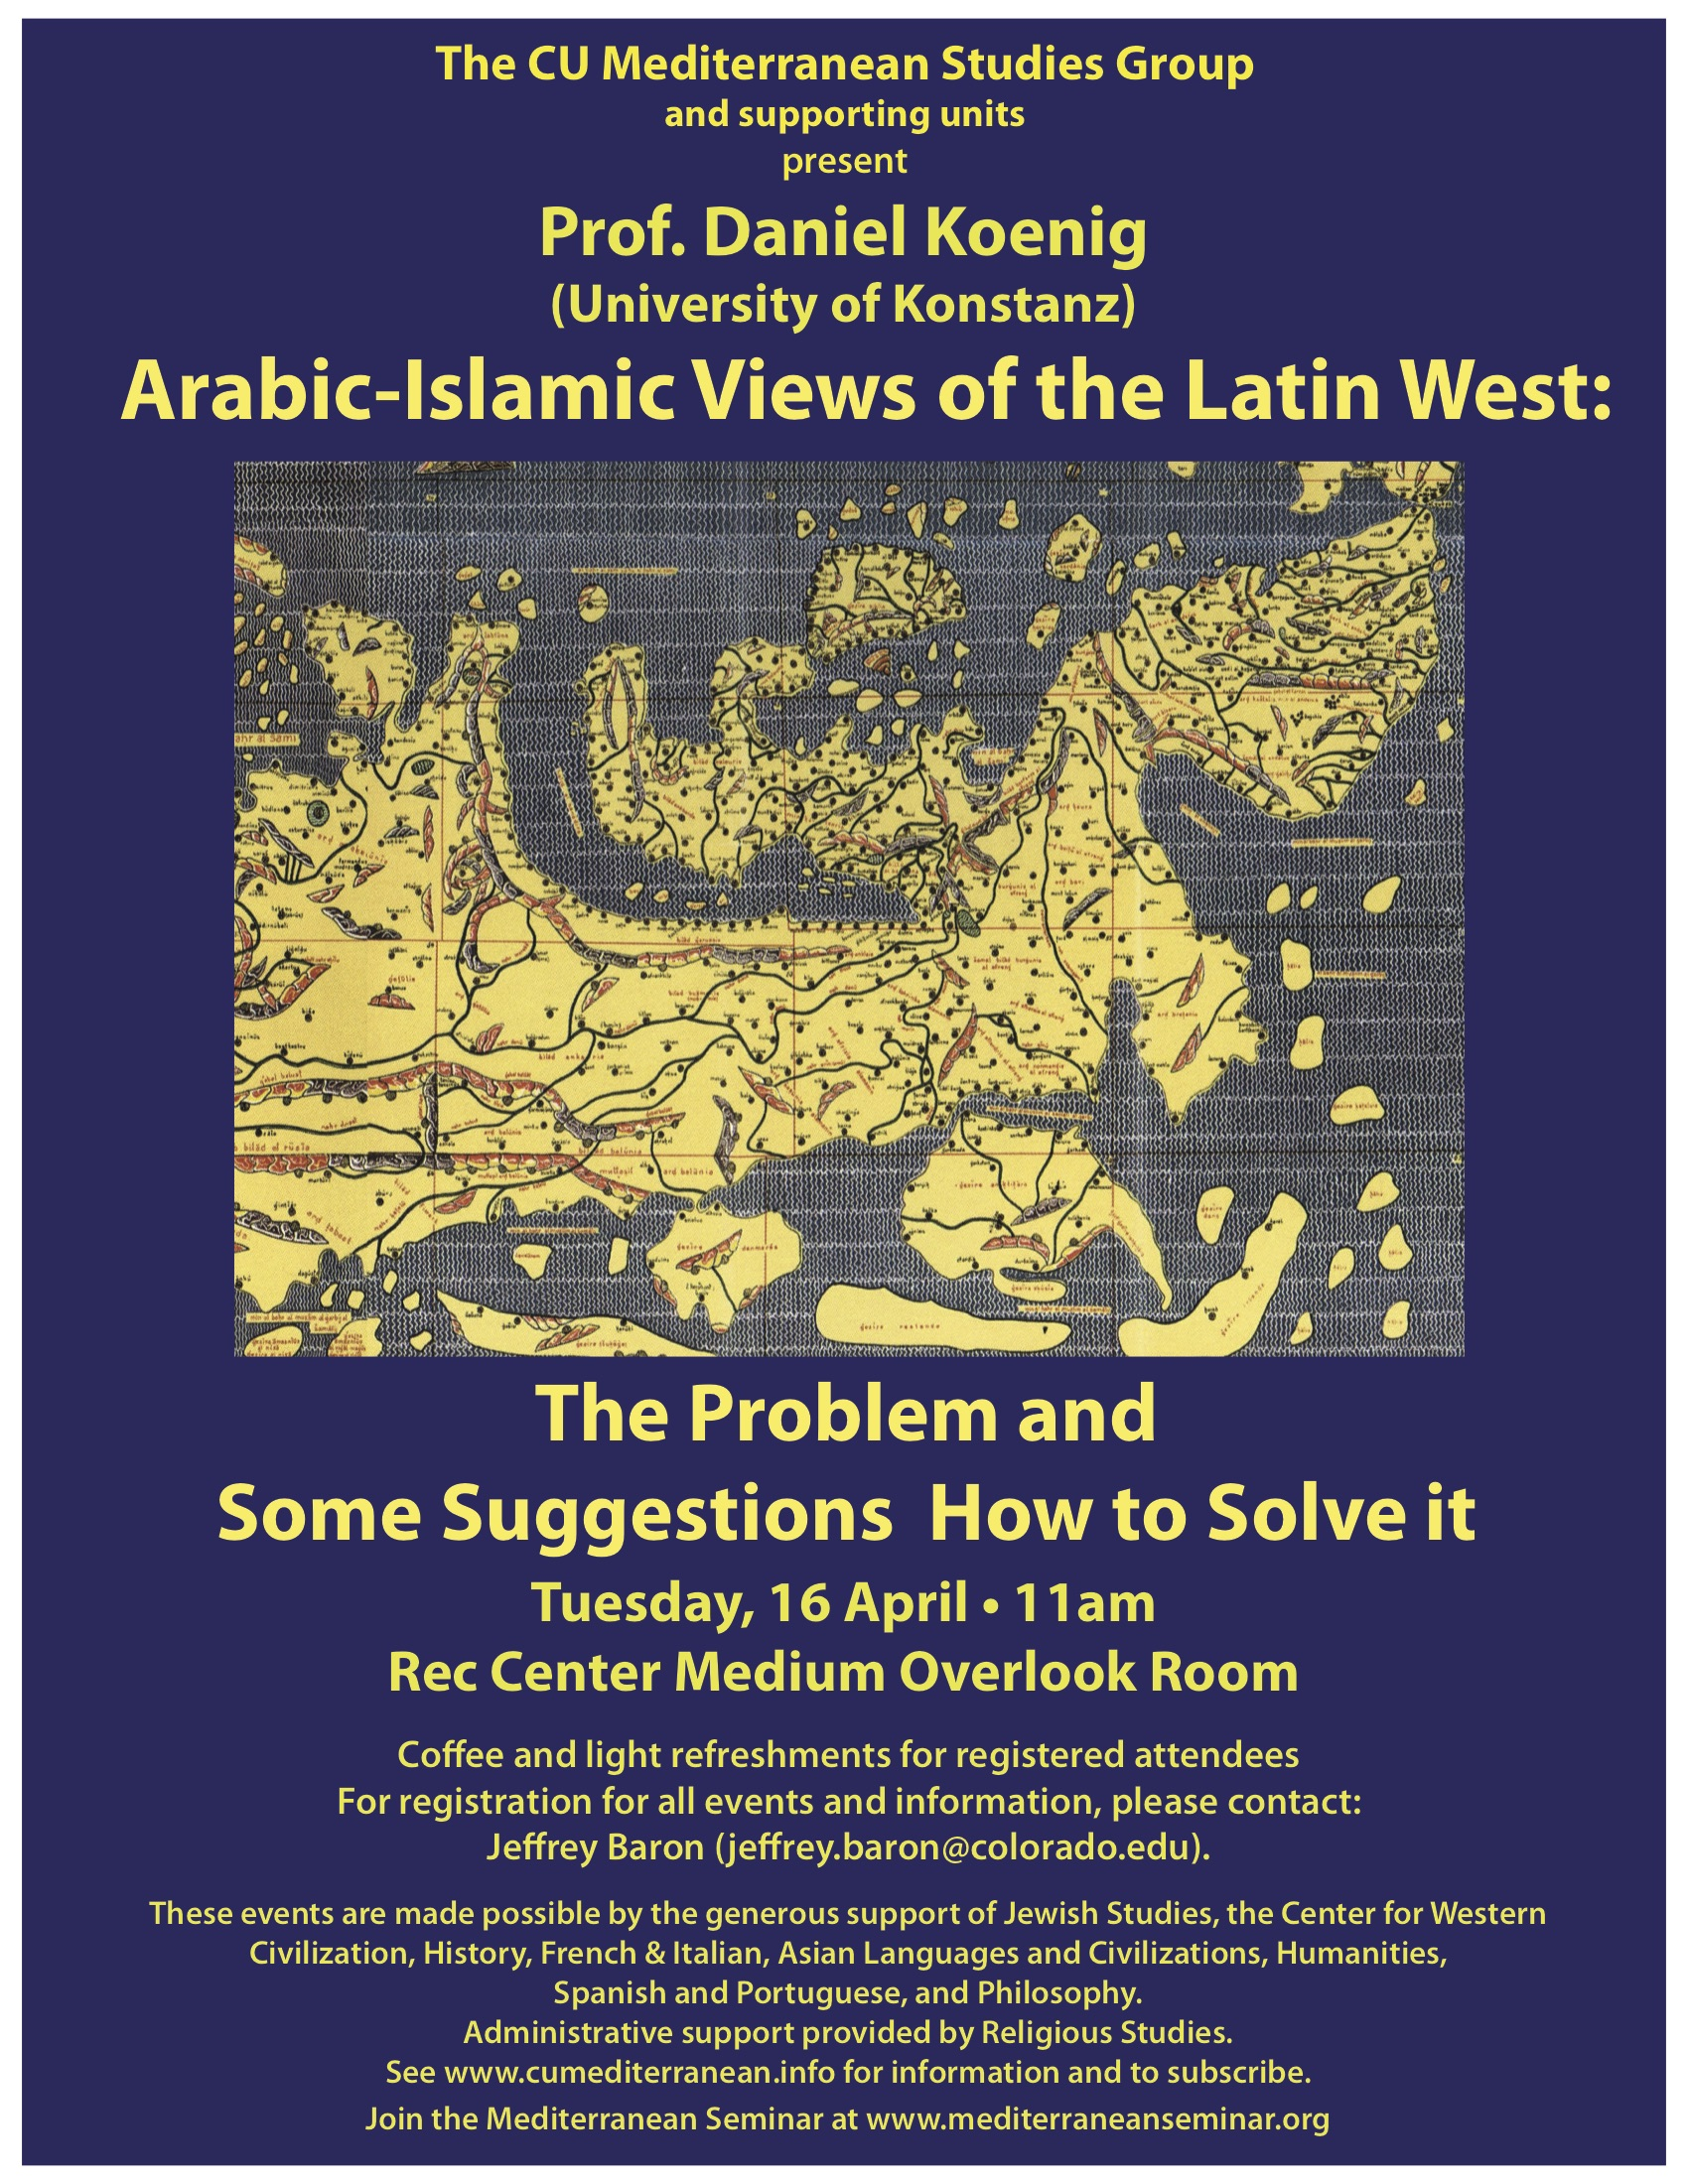 190323 CU Med Group Konig Arabic-Islamic Views.jpg